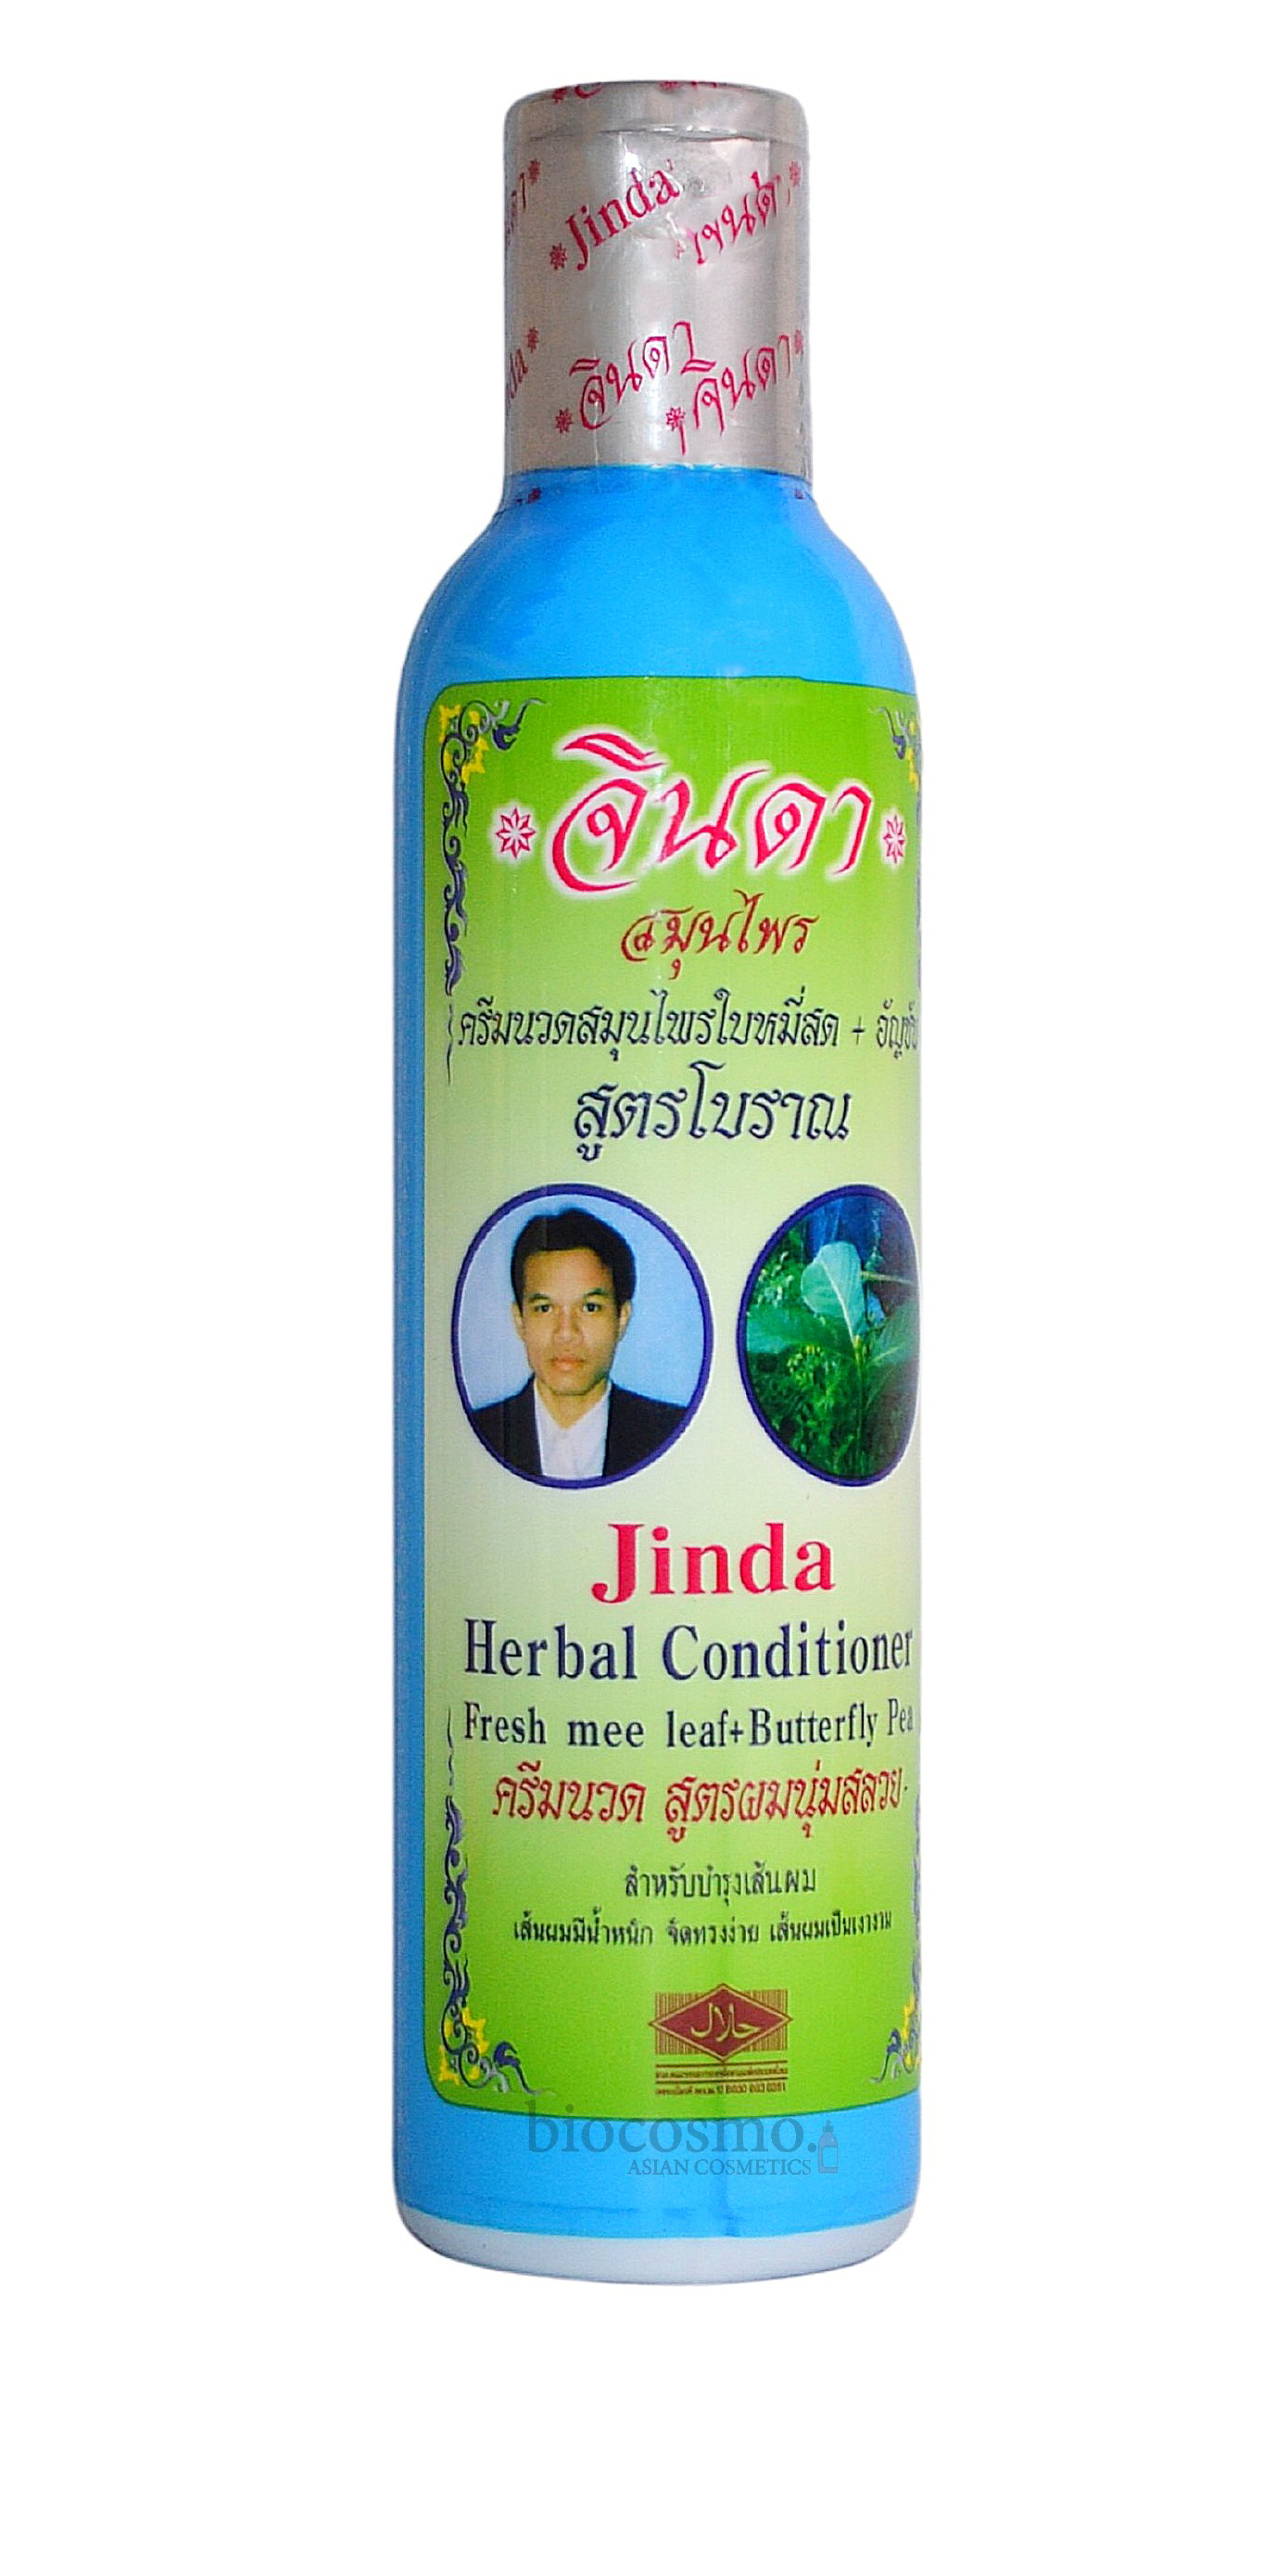 Травяной кондиционер против выпадения волос Jinda Herbal Conditioner Fresh mee leaf + Butterfly Pea - 250 мл